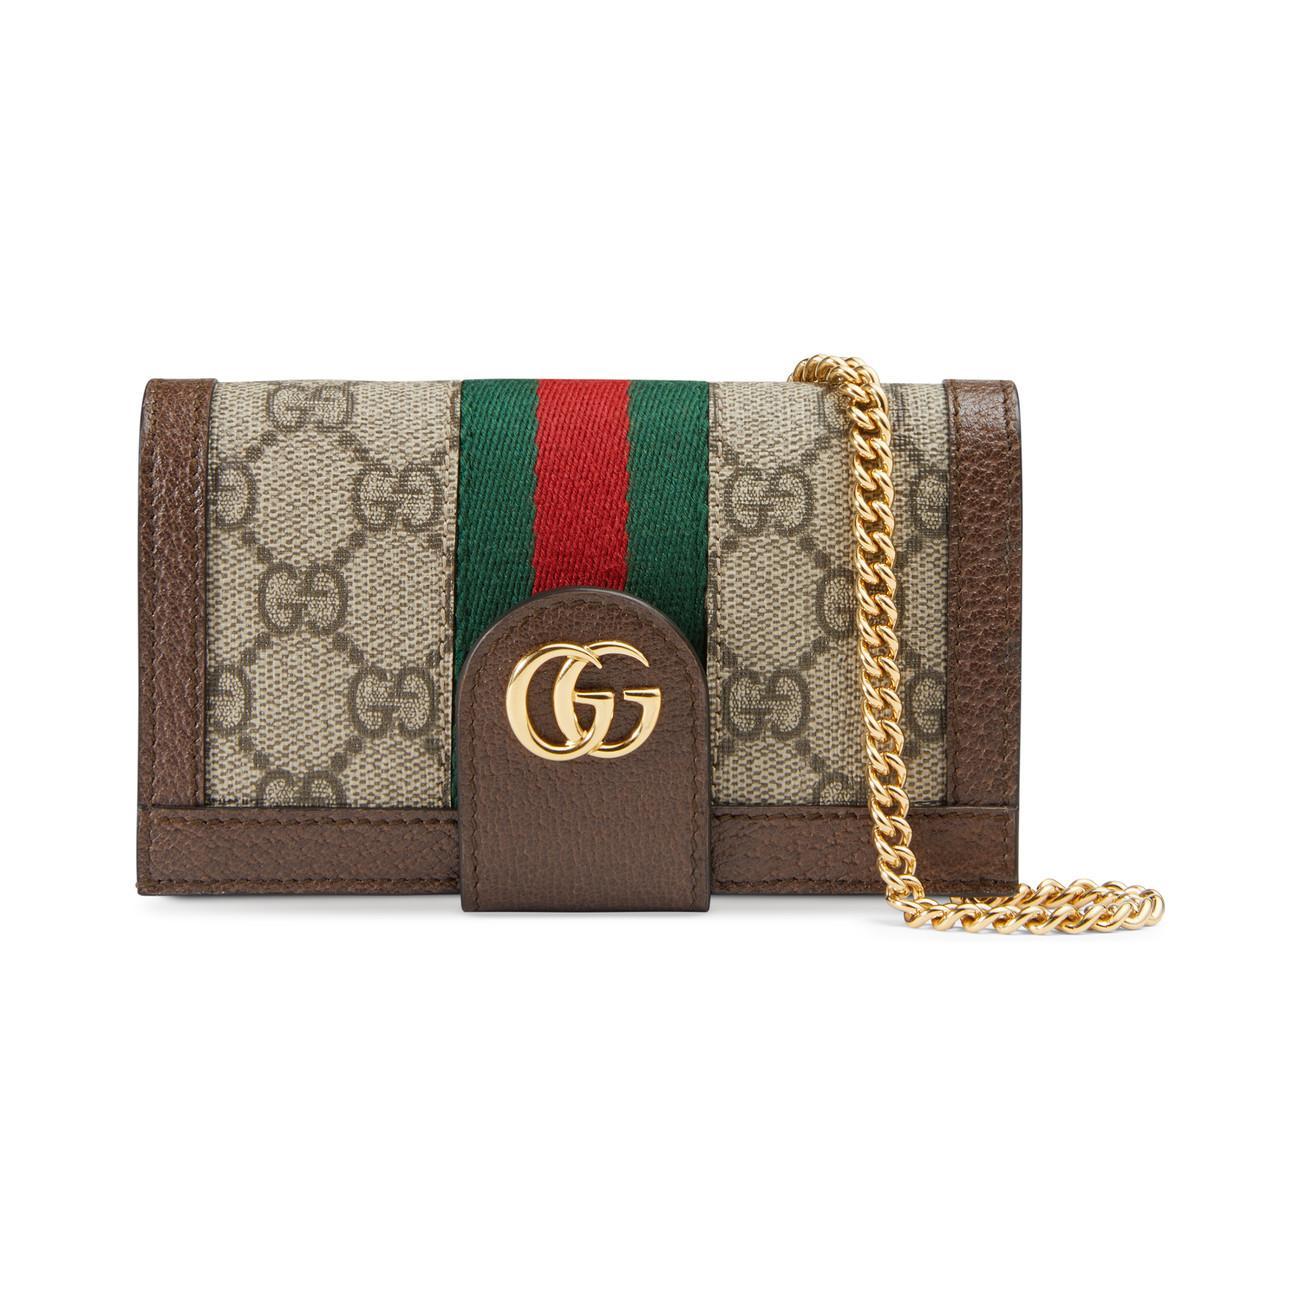 4310d78ac854 Gucci Ophidia GG Chain Iphone 7/8 Case in Metallic - Lyst